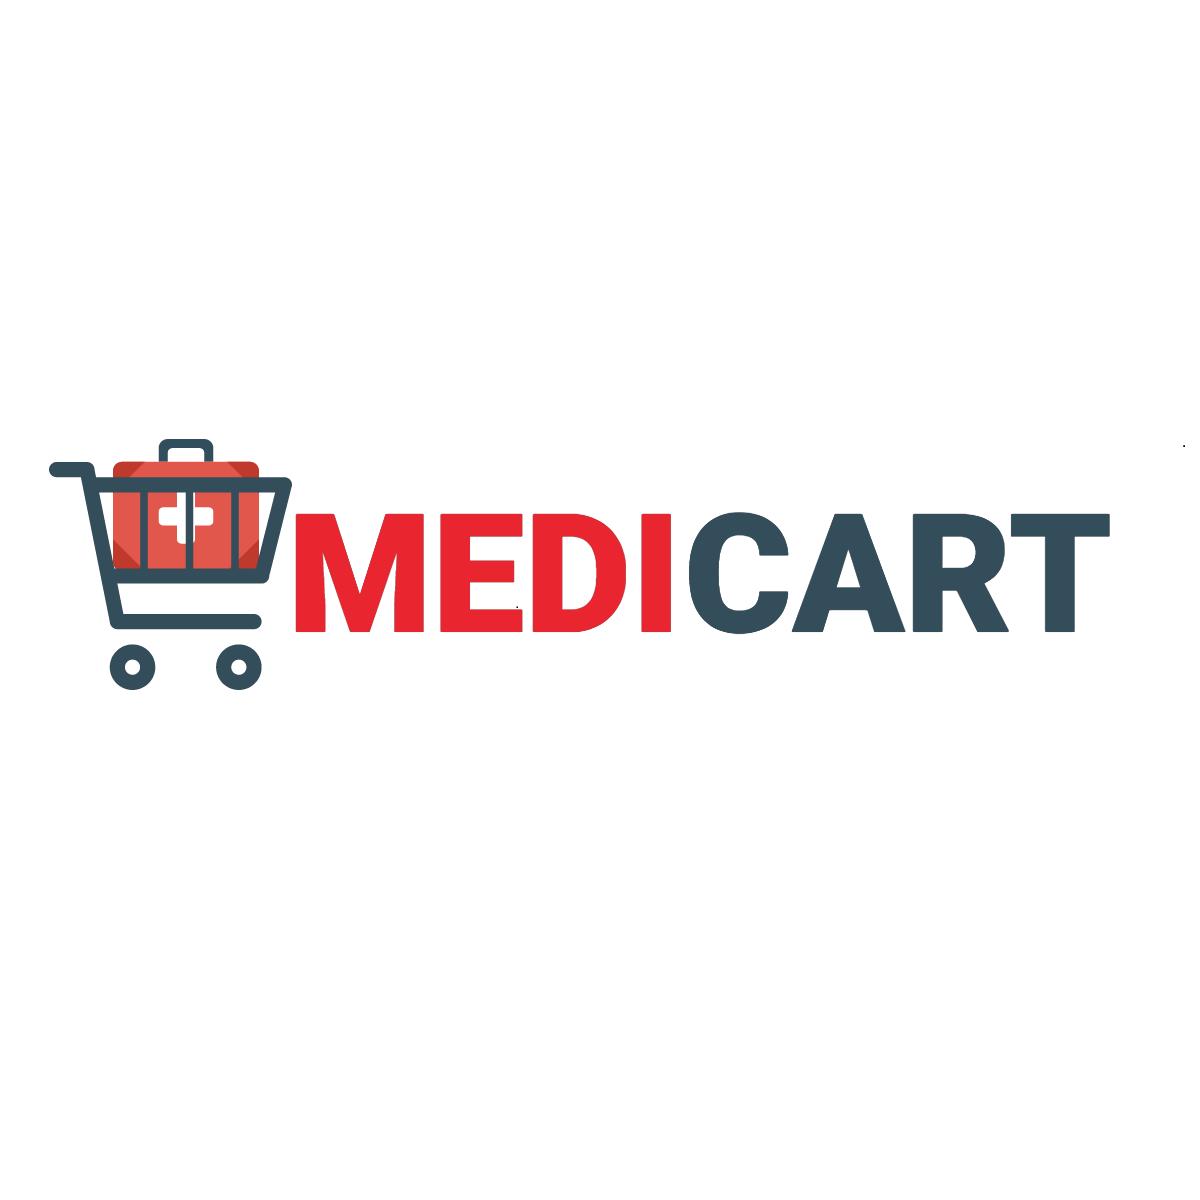 Medicart (1) - Ainatul S.png